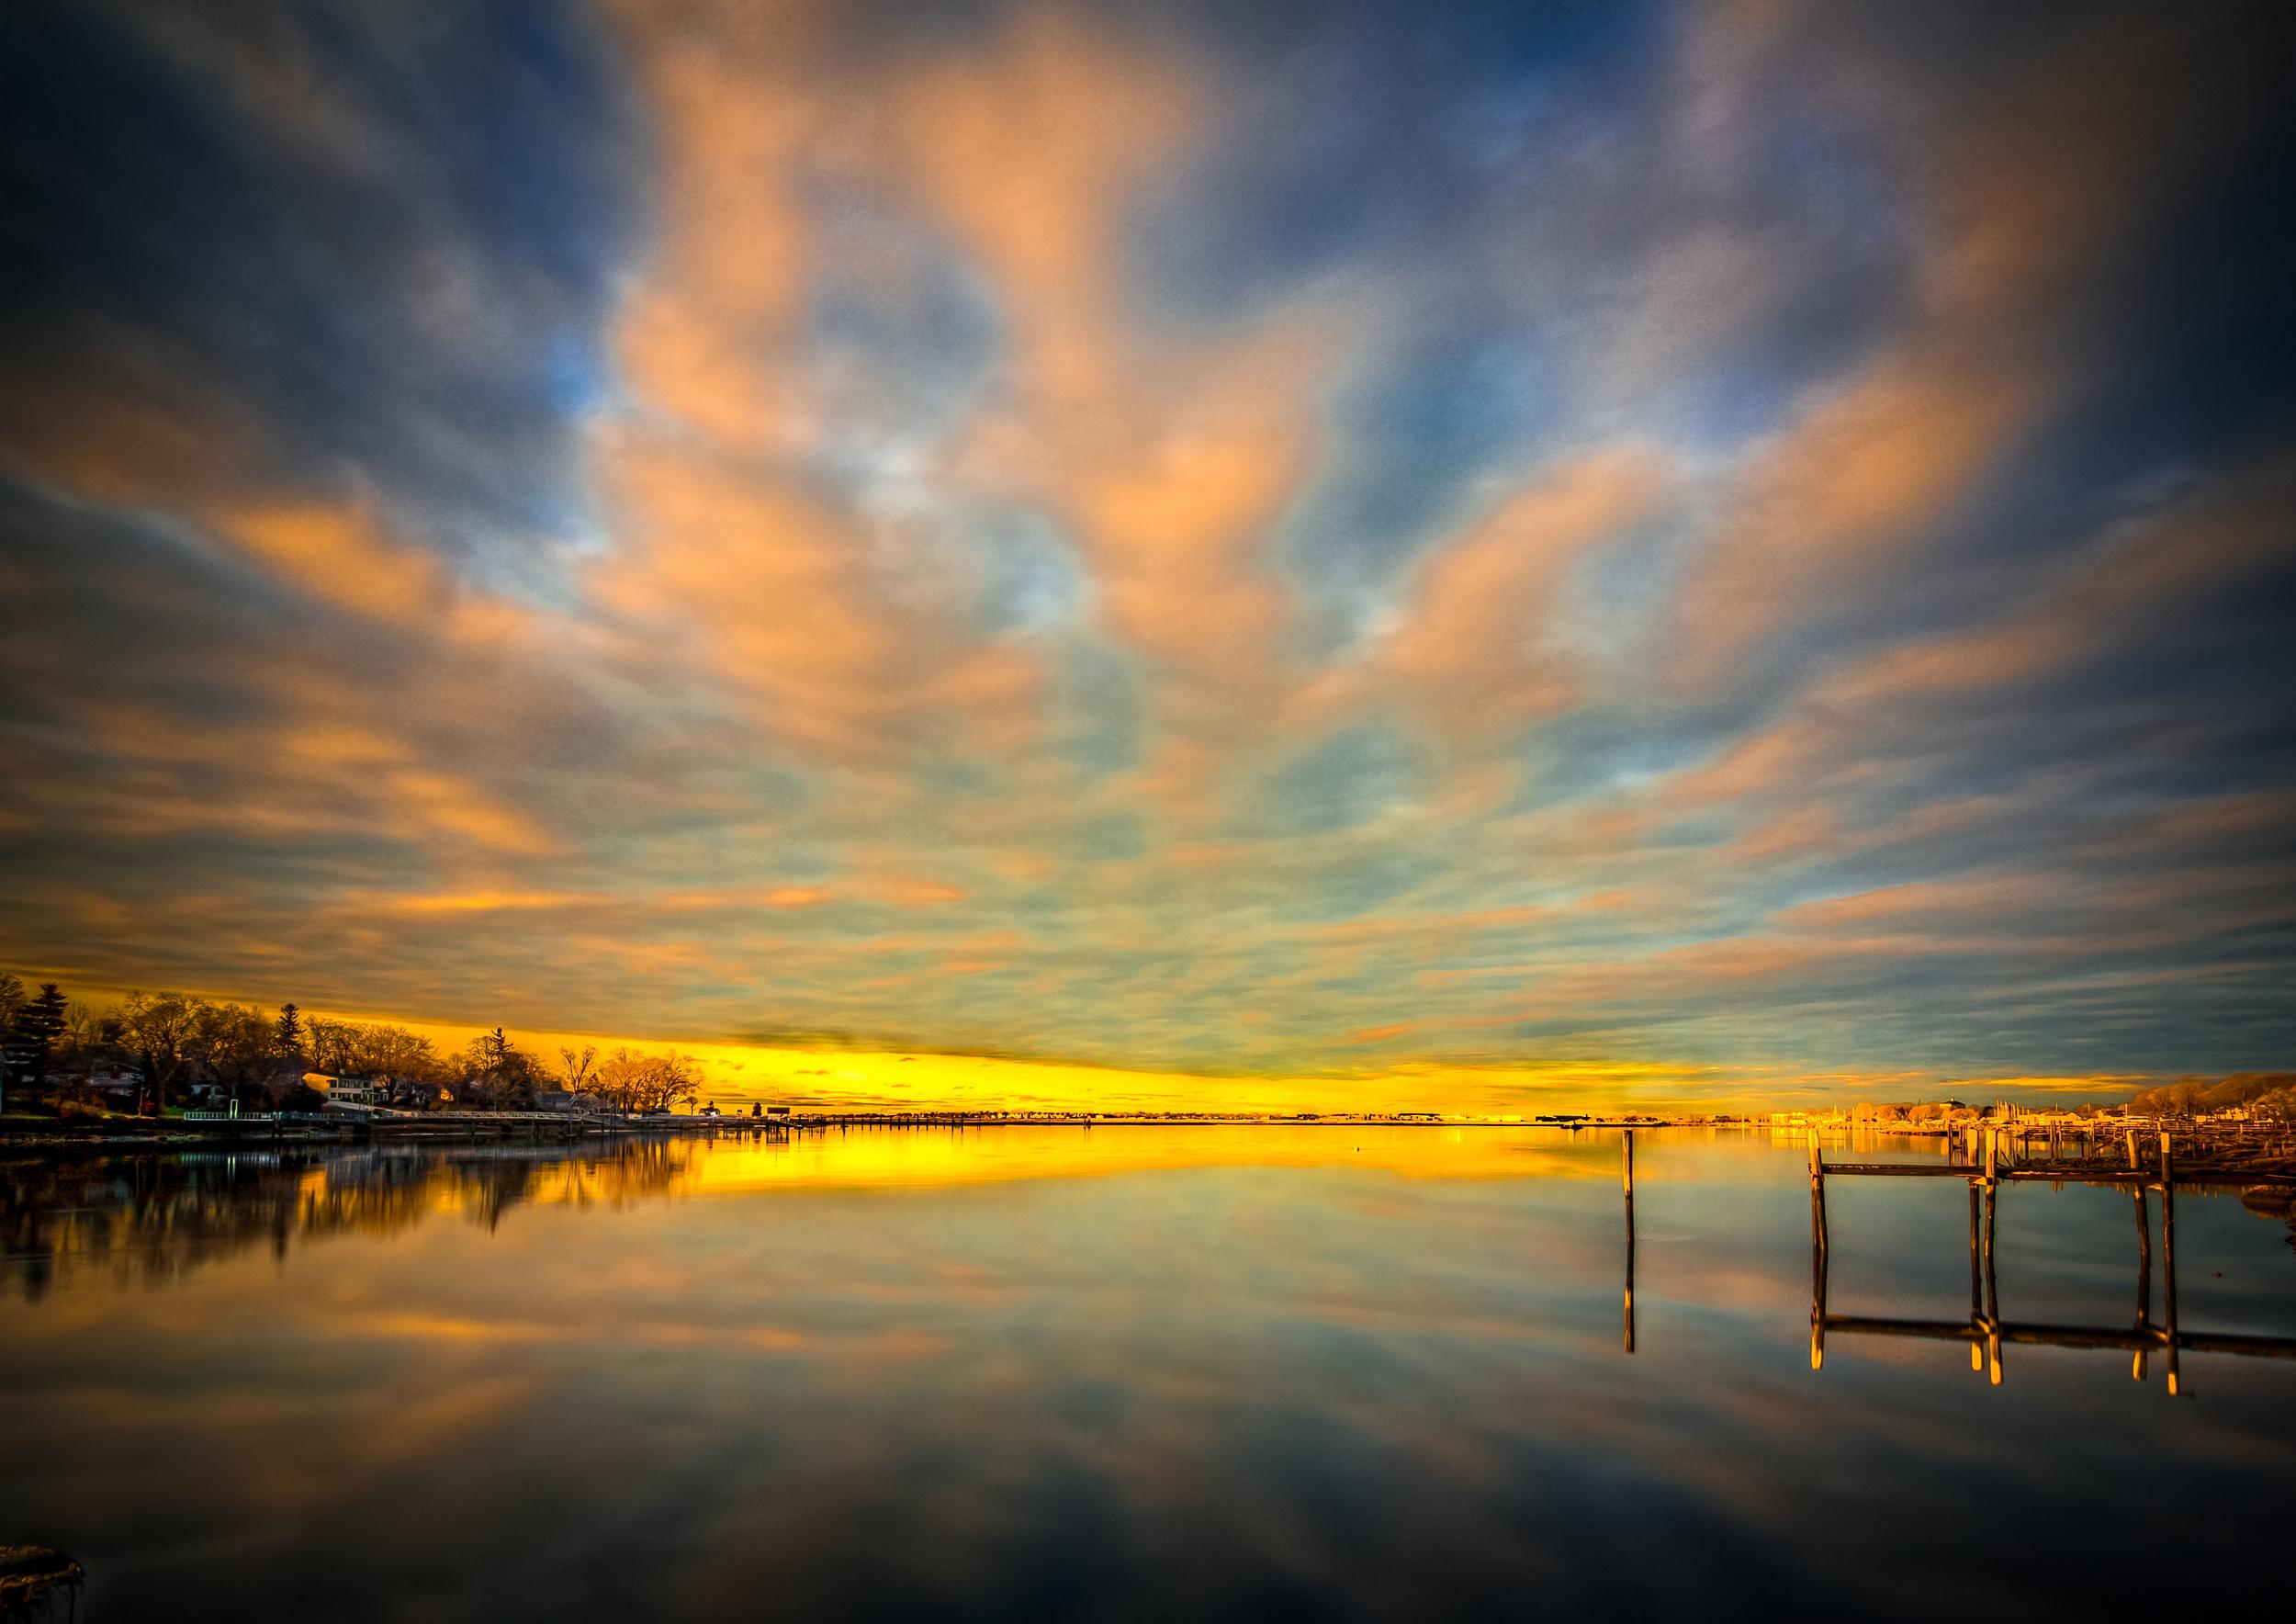 Sunrise in Milford, Connecticut, USA